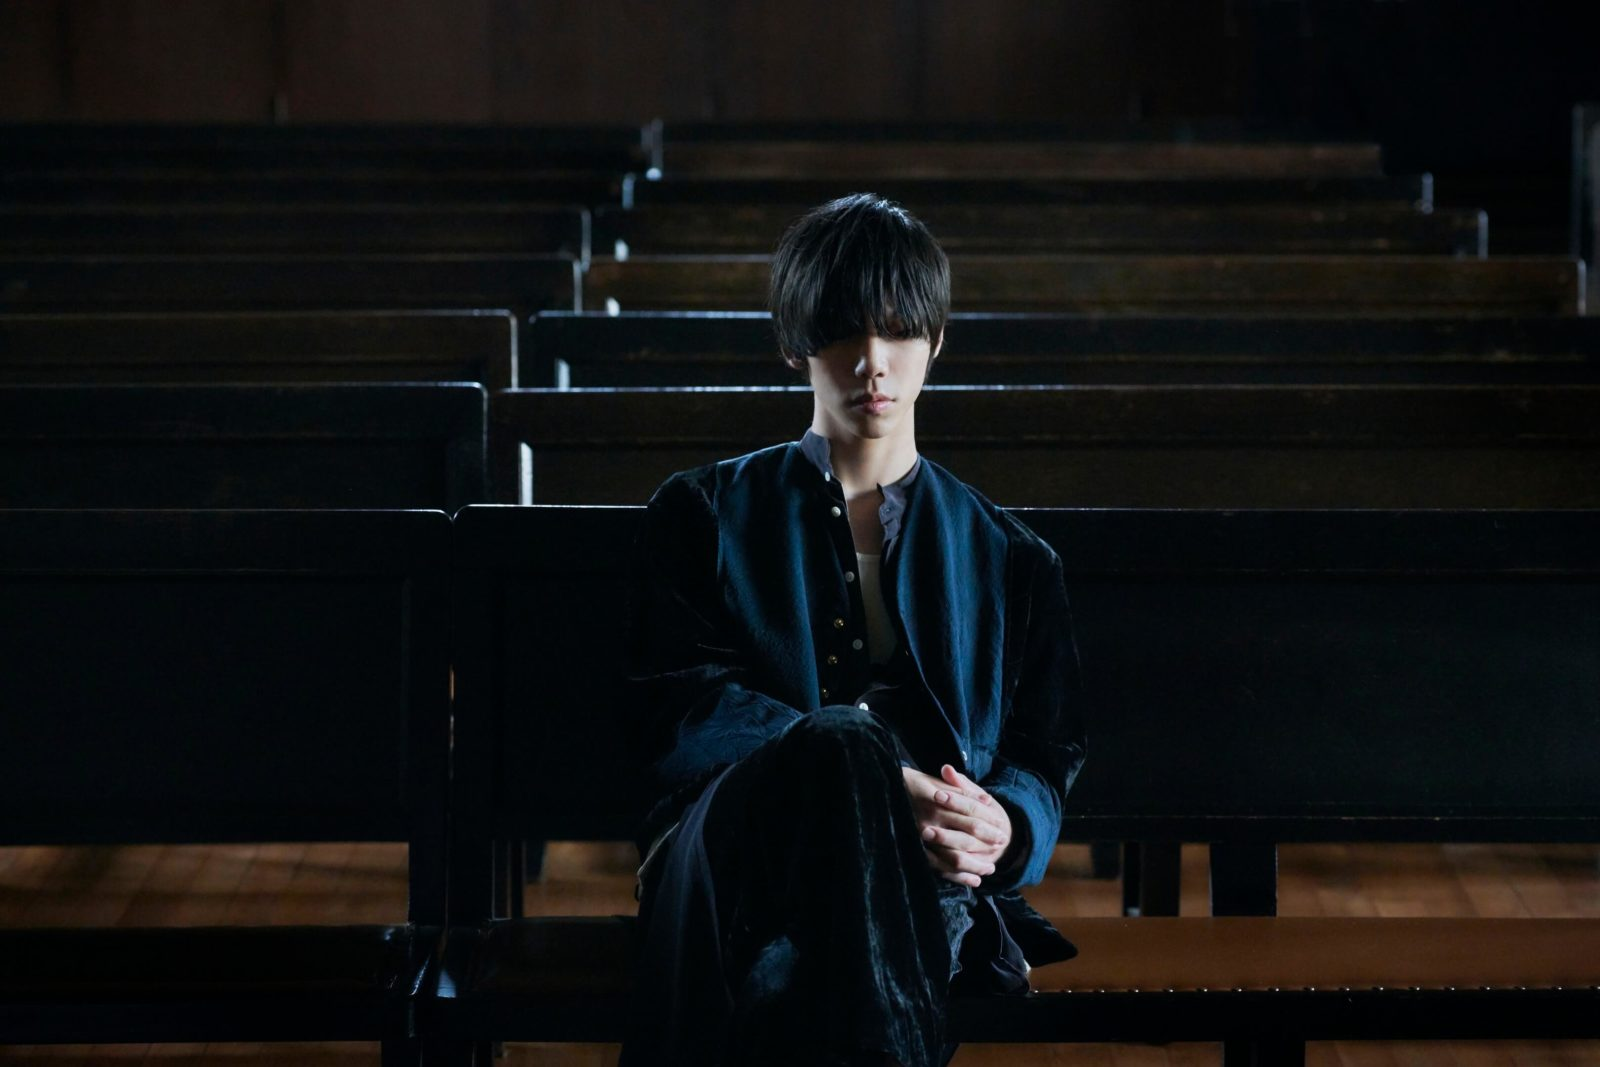 Sano ibuki、デビュー・アルバム『STORY TELLER』全曲ダイジェスト・トレーラー本日公開サムネイル画像